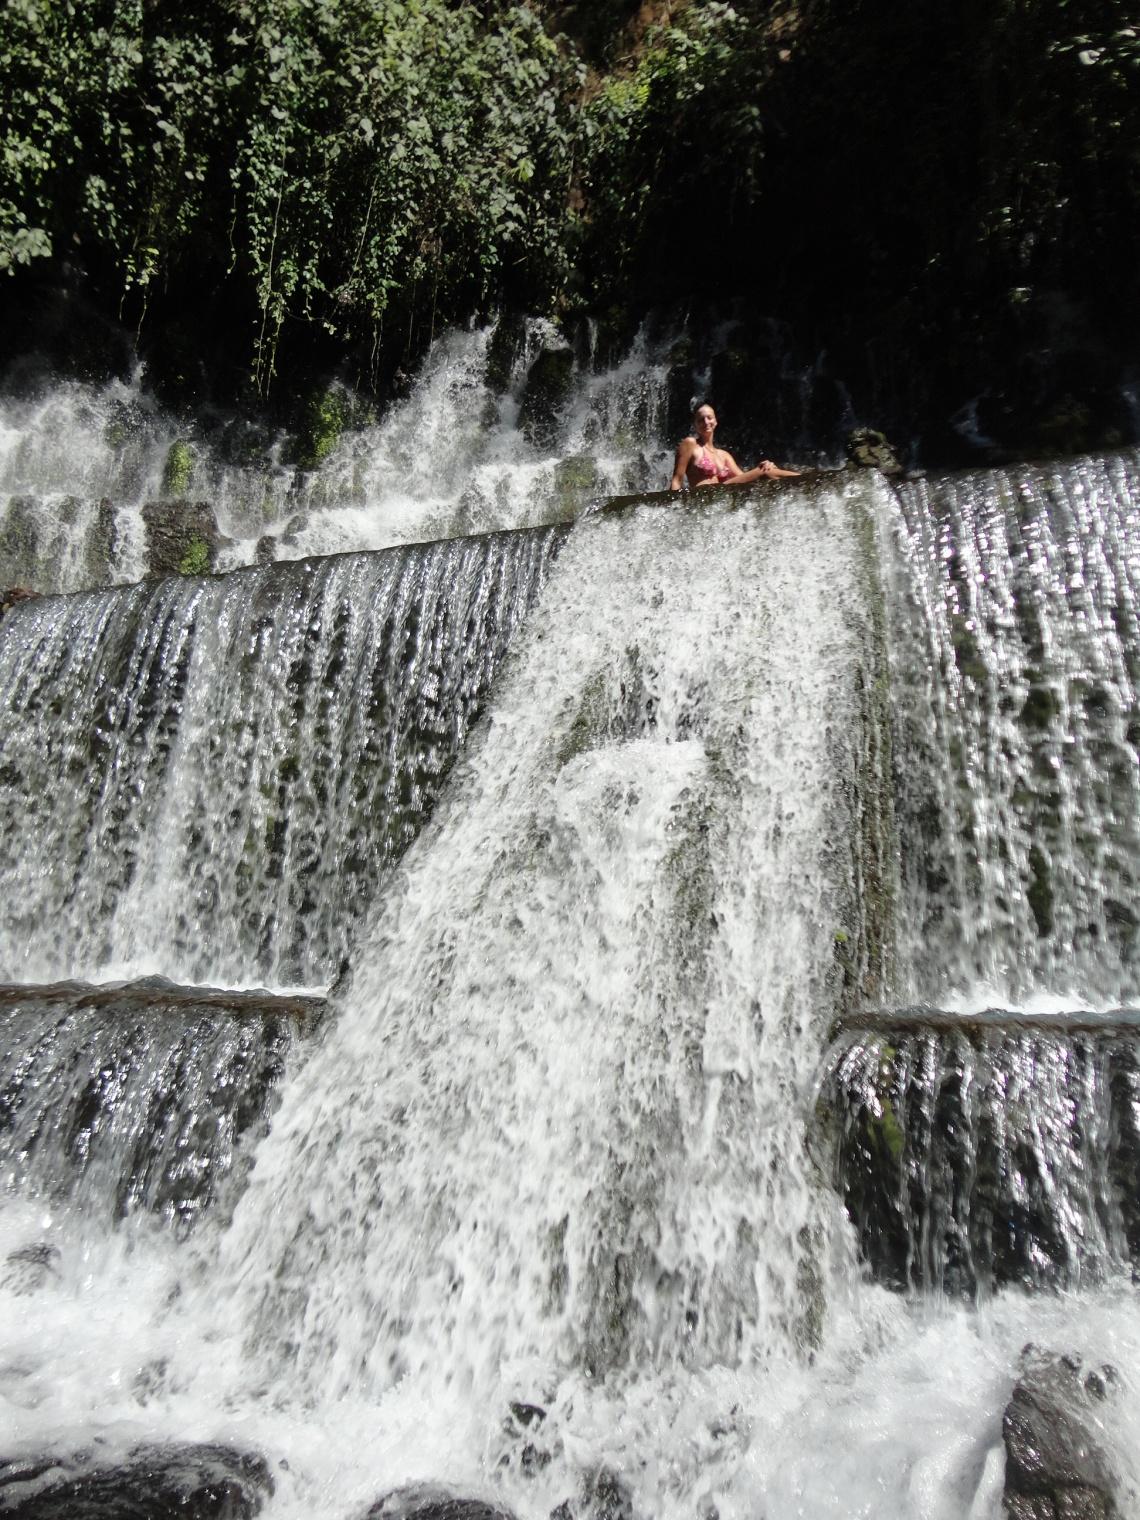 Cooling off at a waterfall outside of Juayua